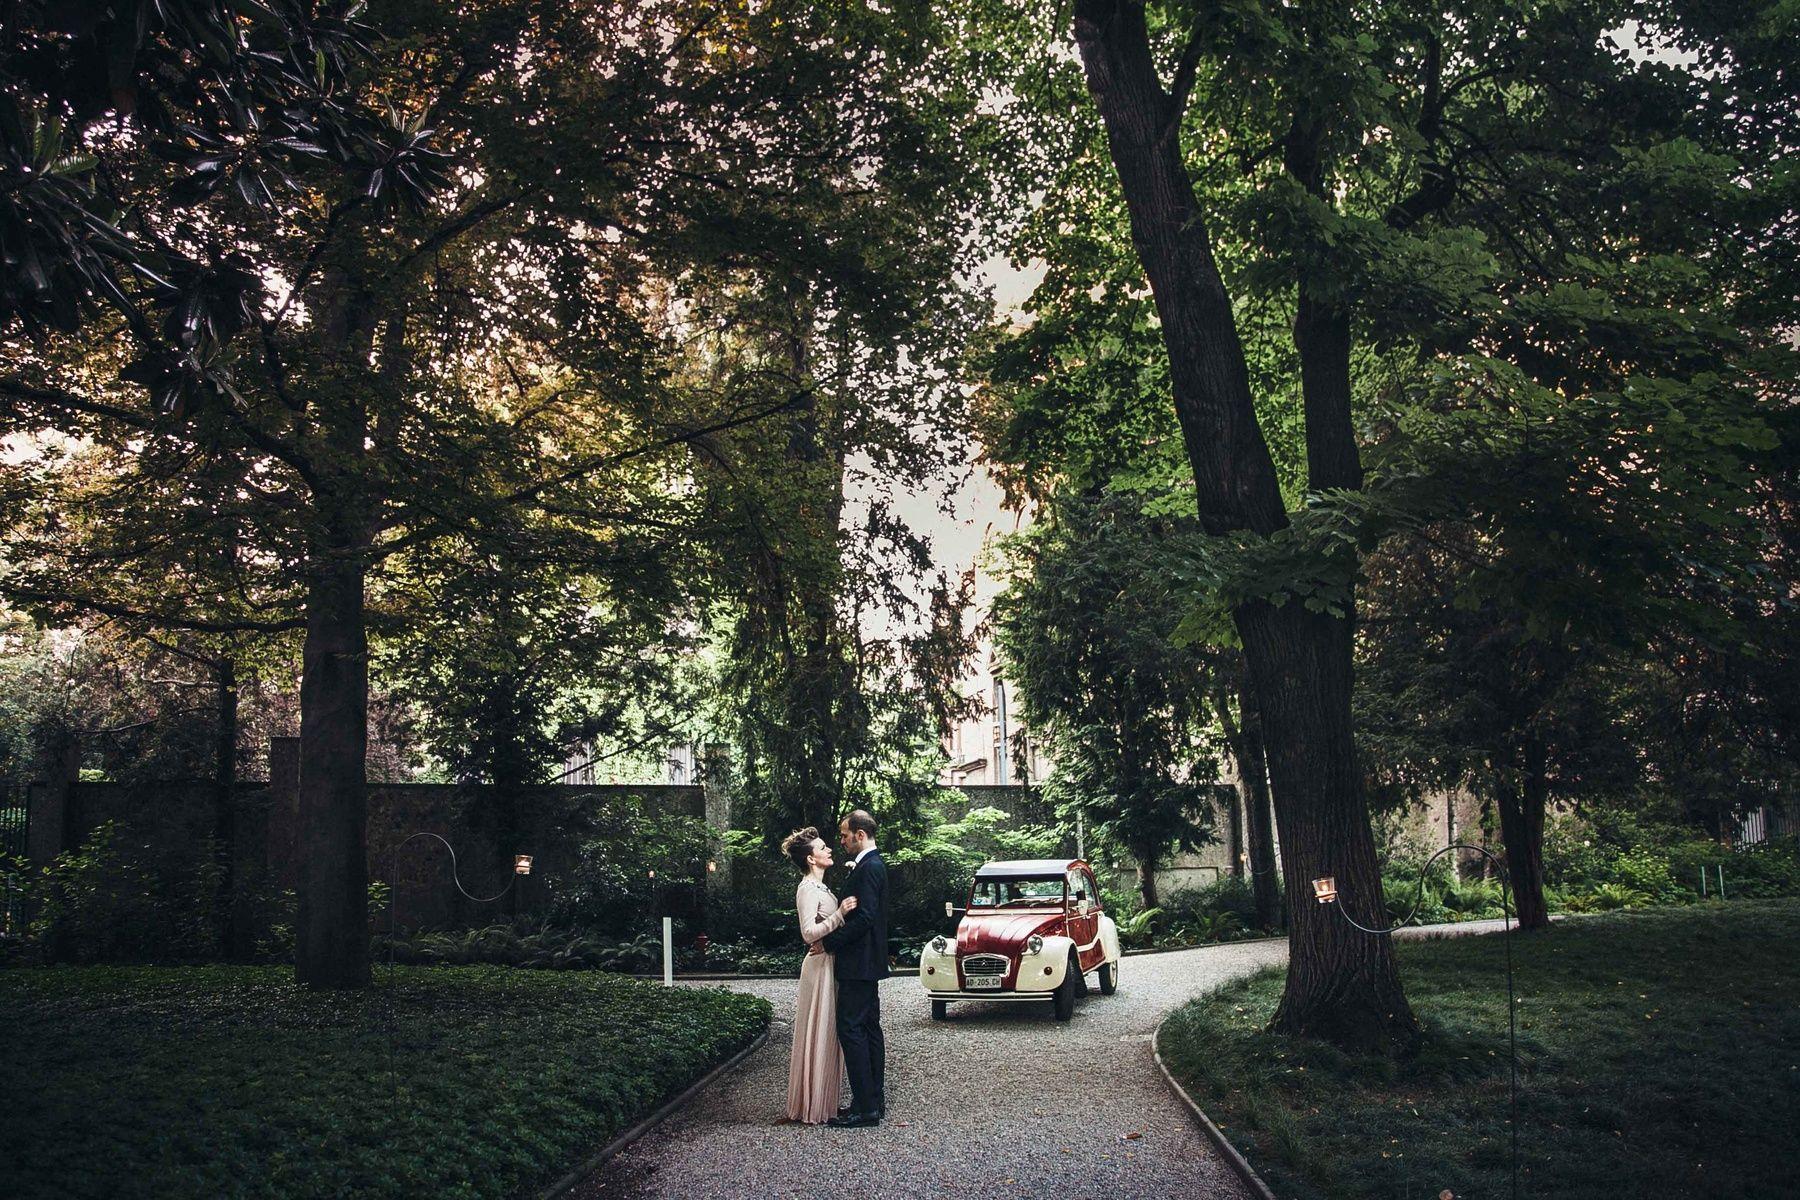 fulham, west london fine art destination wedding photographer - portfolio